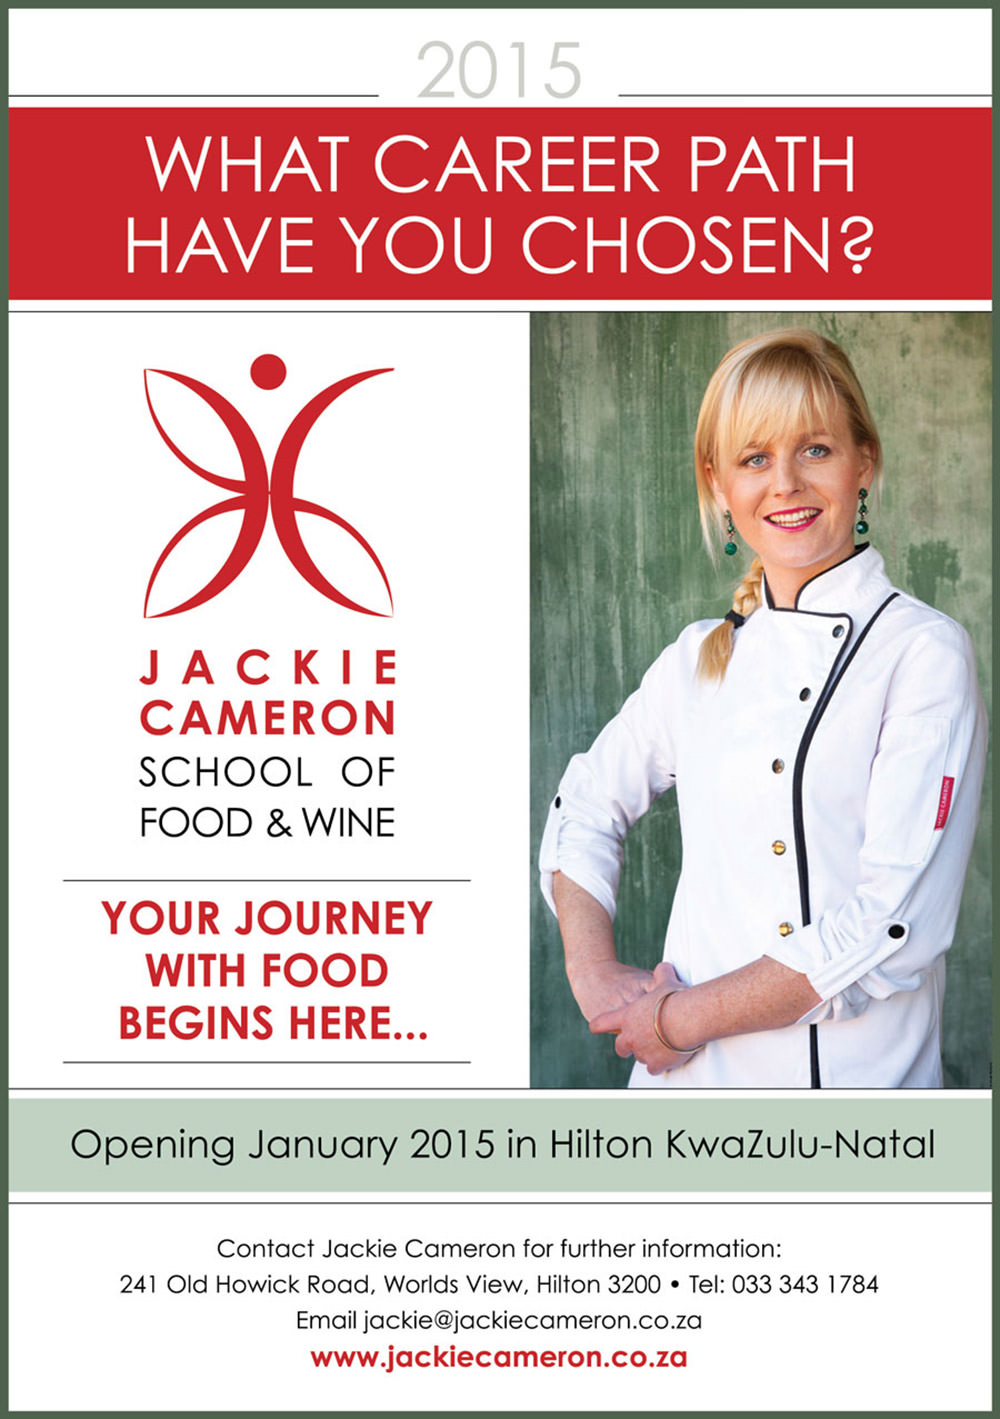 Jackie Cameron School of Food and Wine